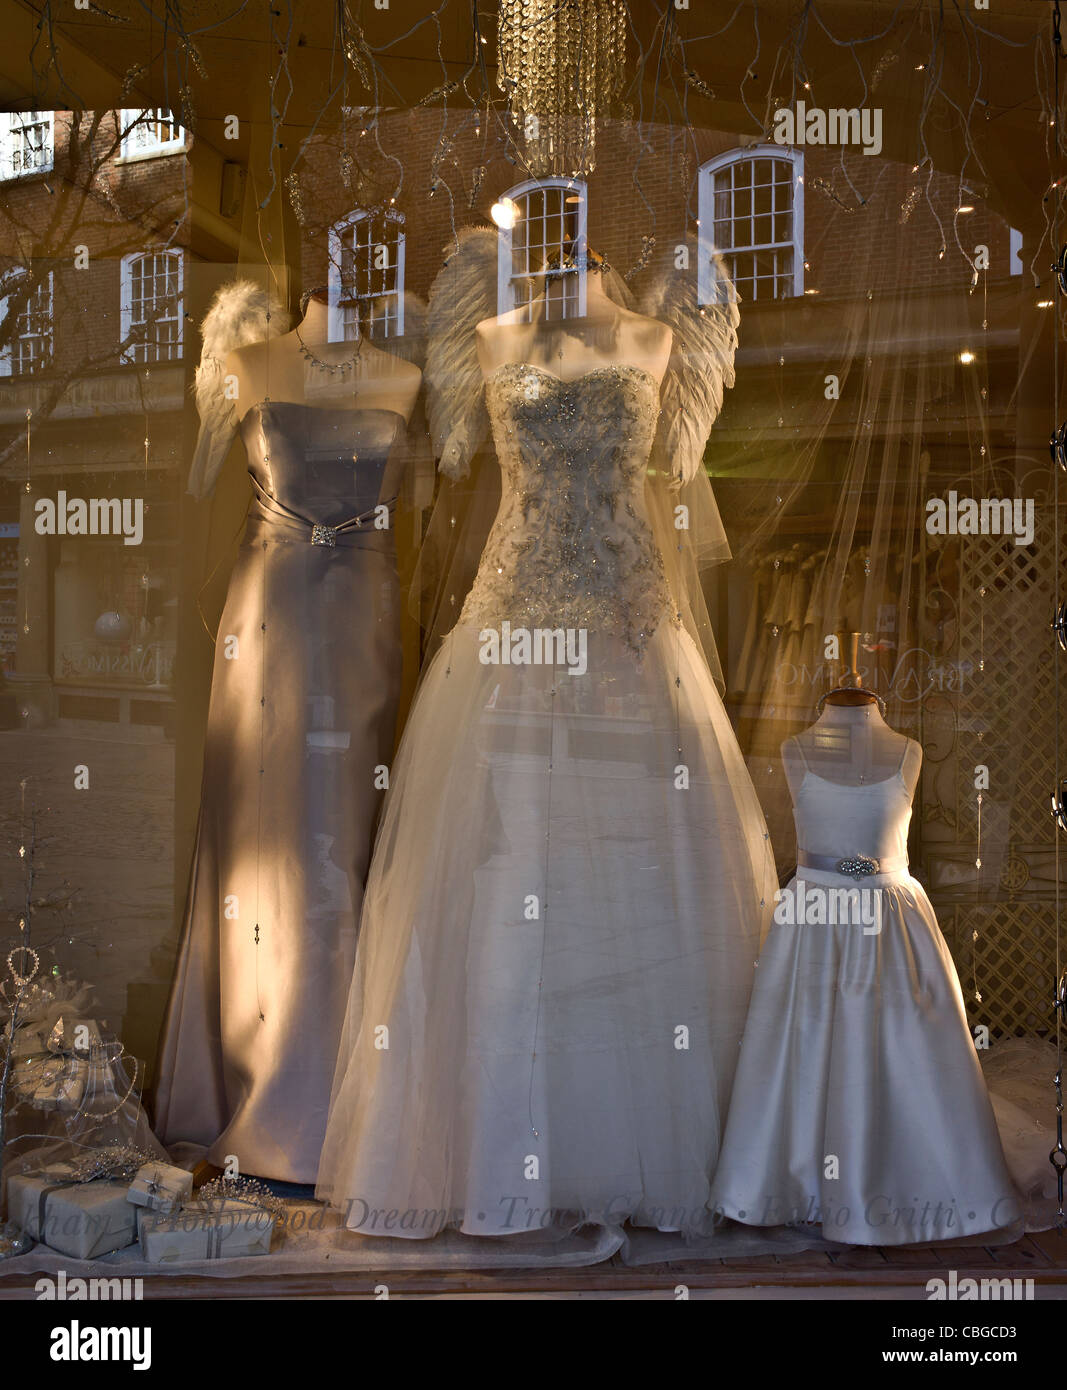 Wedding dress shop window with reflections Stock Photo